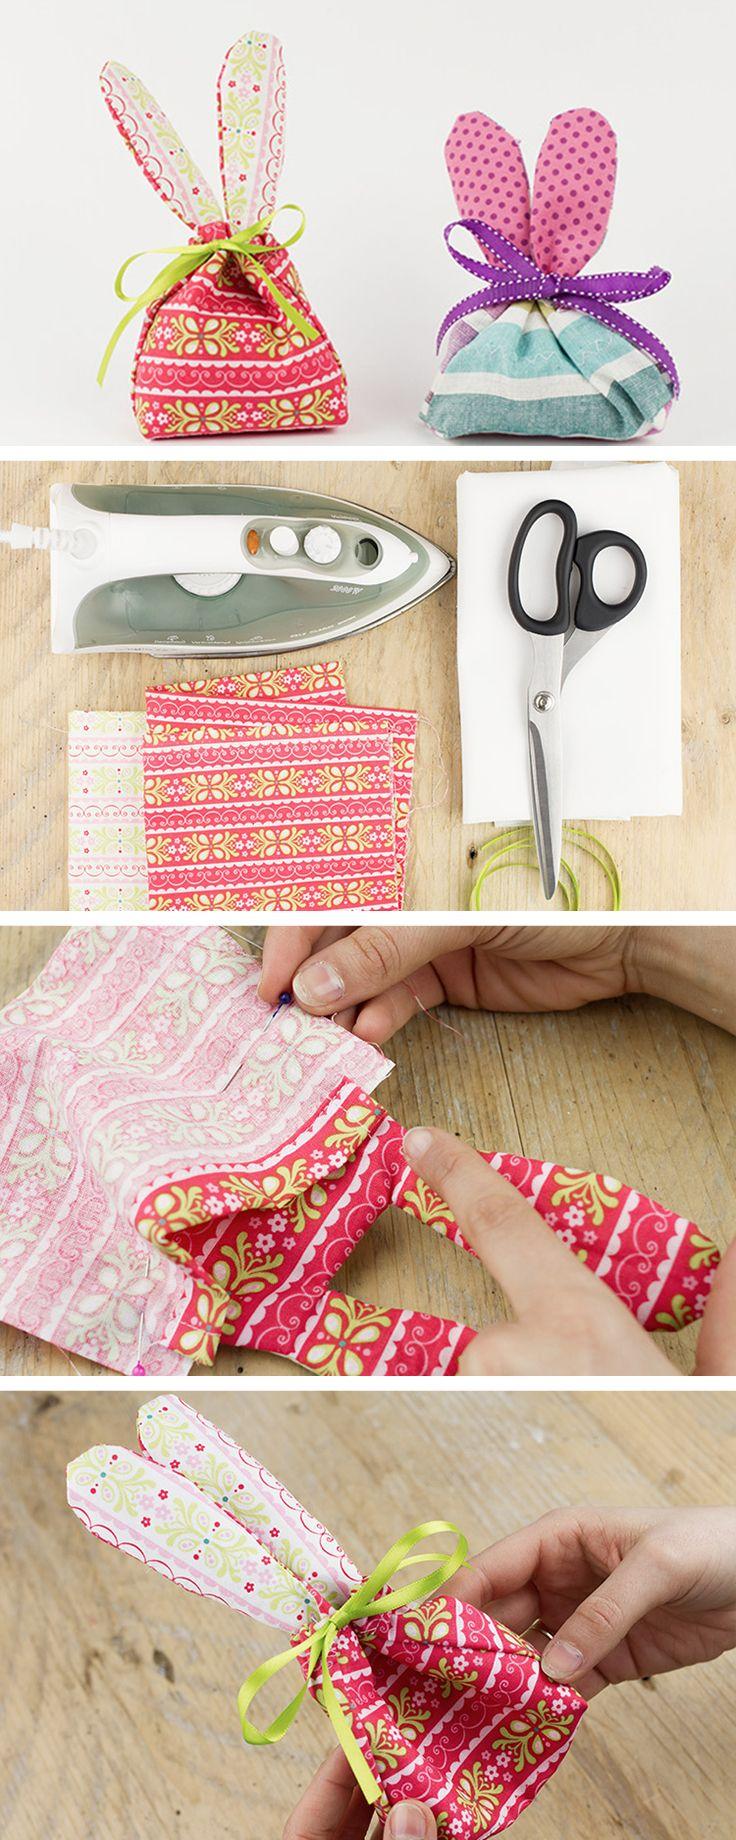 Tutorial fai da te come fare sacchetto a forma di coniglio via tutorial fai da te come fare sacchetto a forma di coniglio via dawanda easter gifteaster negle Choice Image